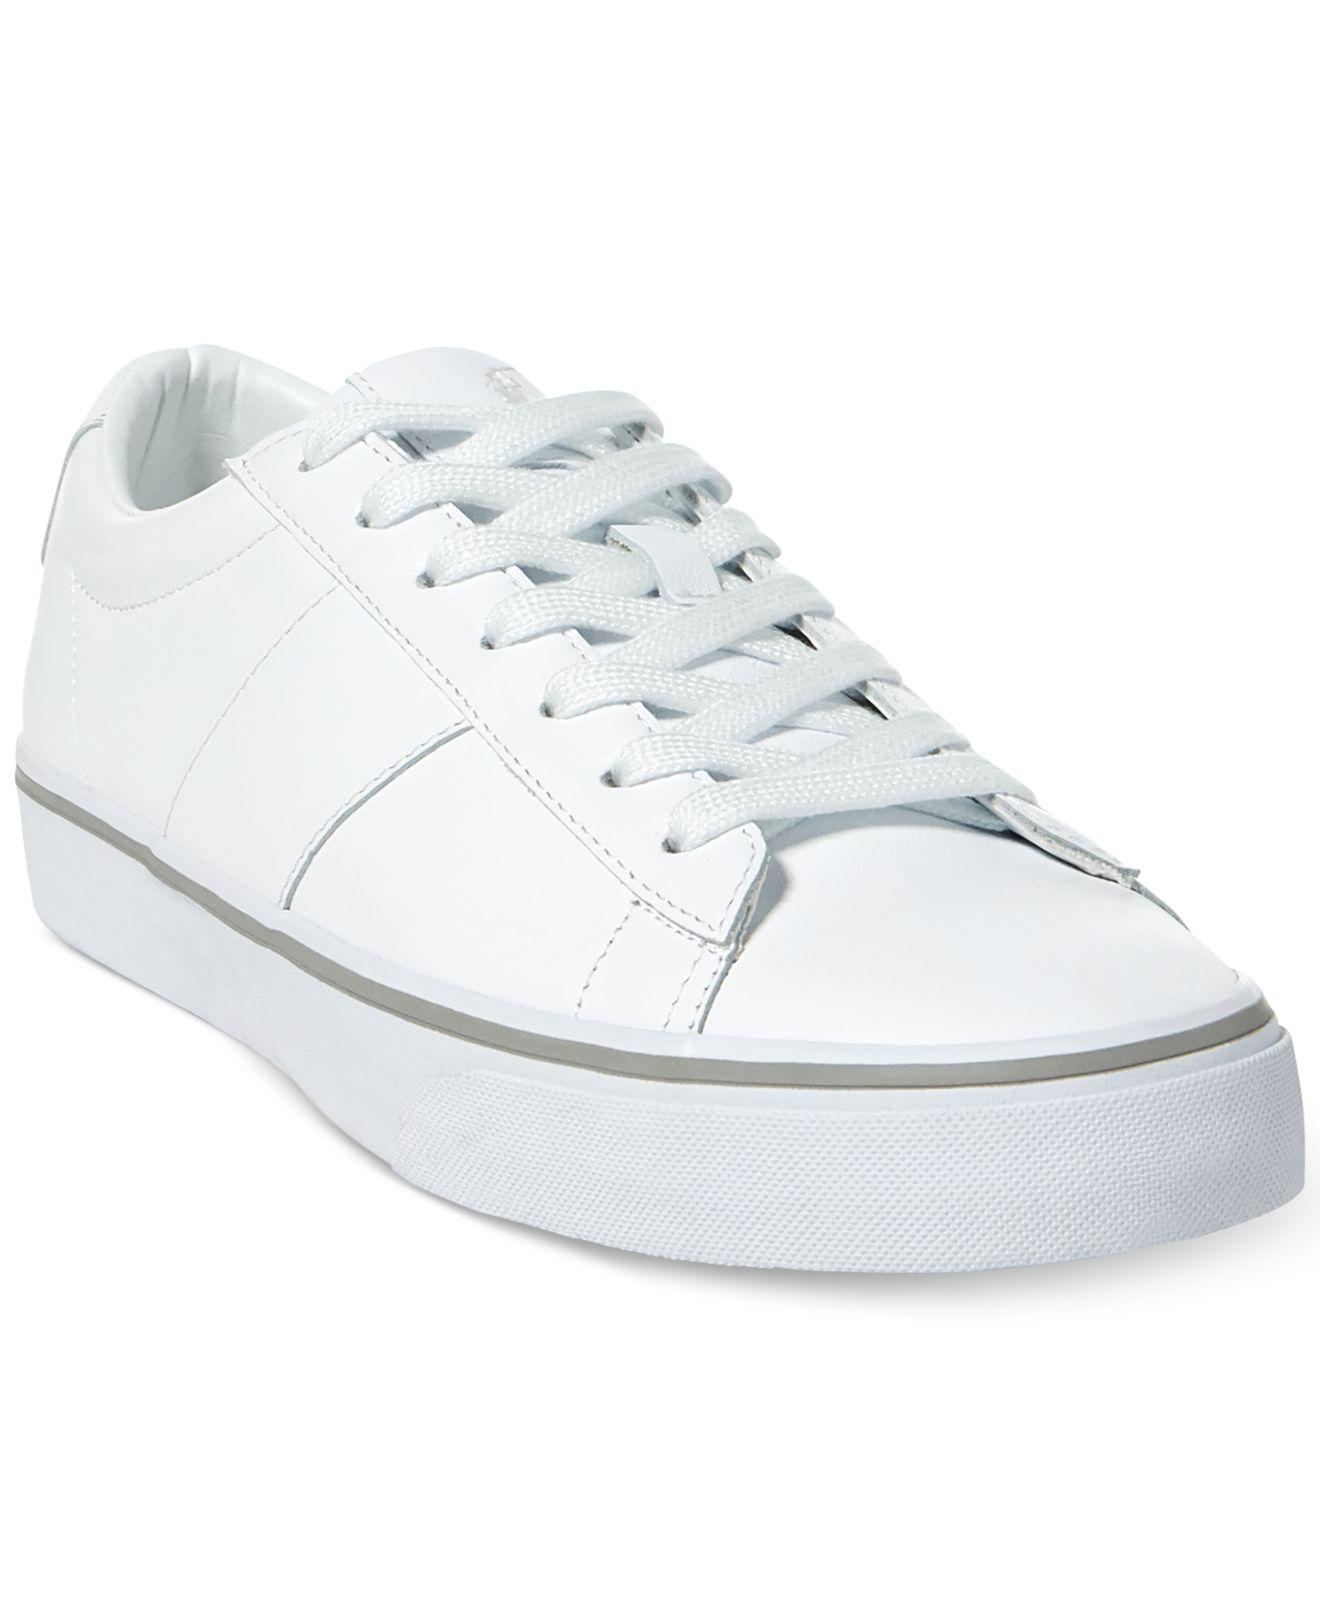 Low Ralph White Men's Sneakers Lauren Top Sayer Men For Polo 3j5Lq4AR